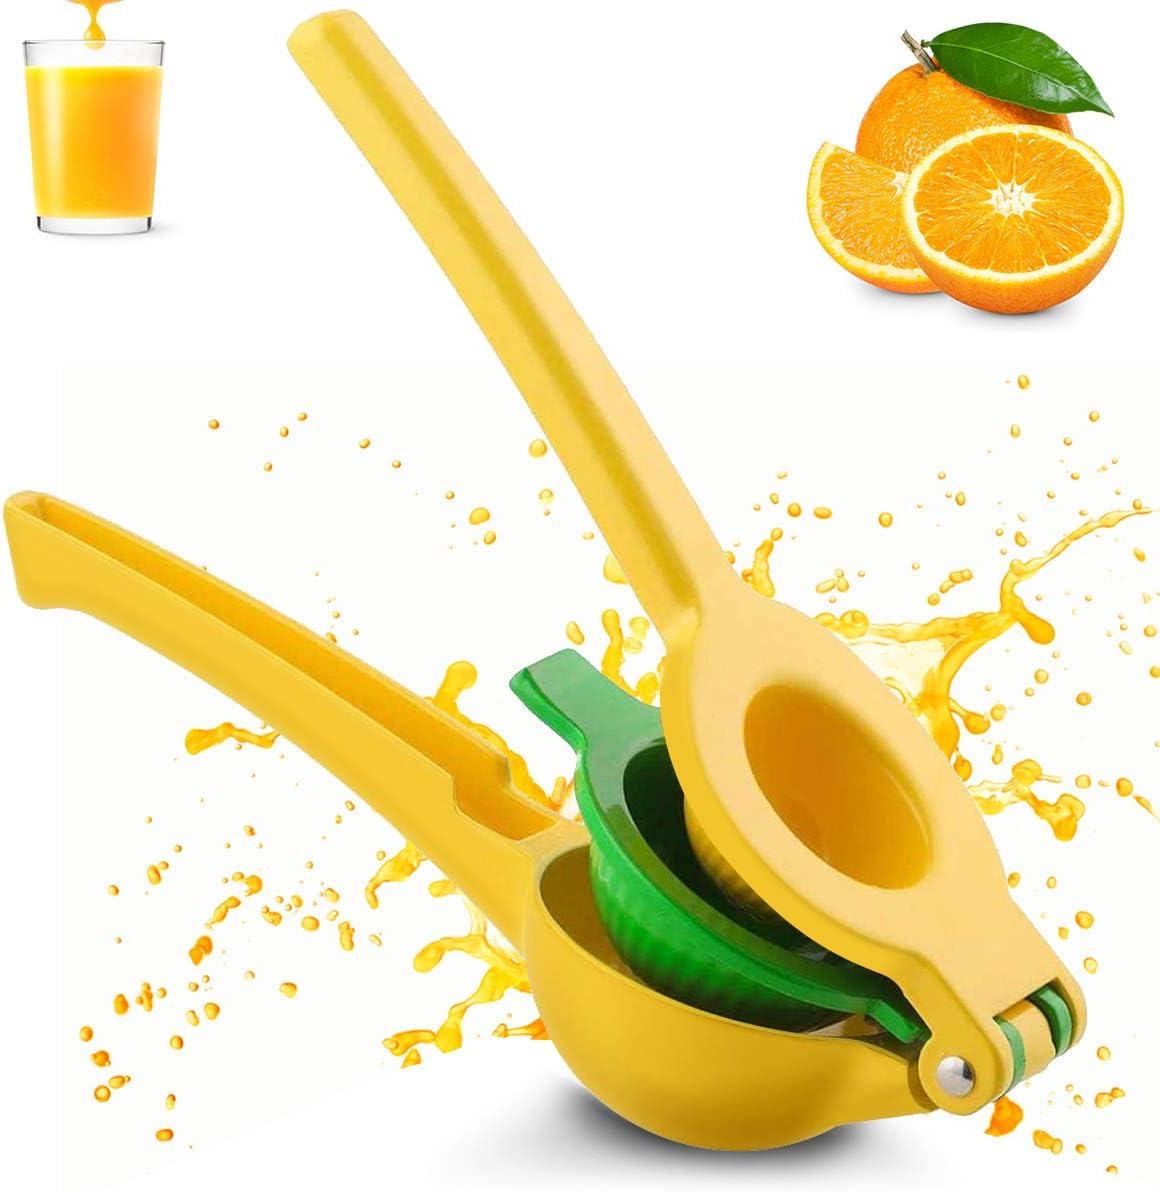 JOMOQ Lemon Squeezer Lime Squeezer Juicer Citrus Juicer Hand Press Manual Juicer, Professional Metal Hand Jucier Handheld Fruit Juicer Faster, Kitchen Lime Squeezer Bar Tool(Yellow)